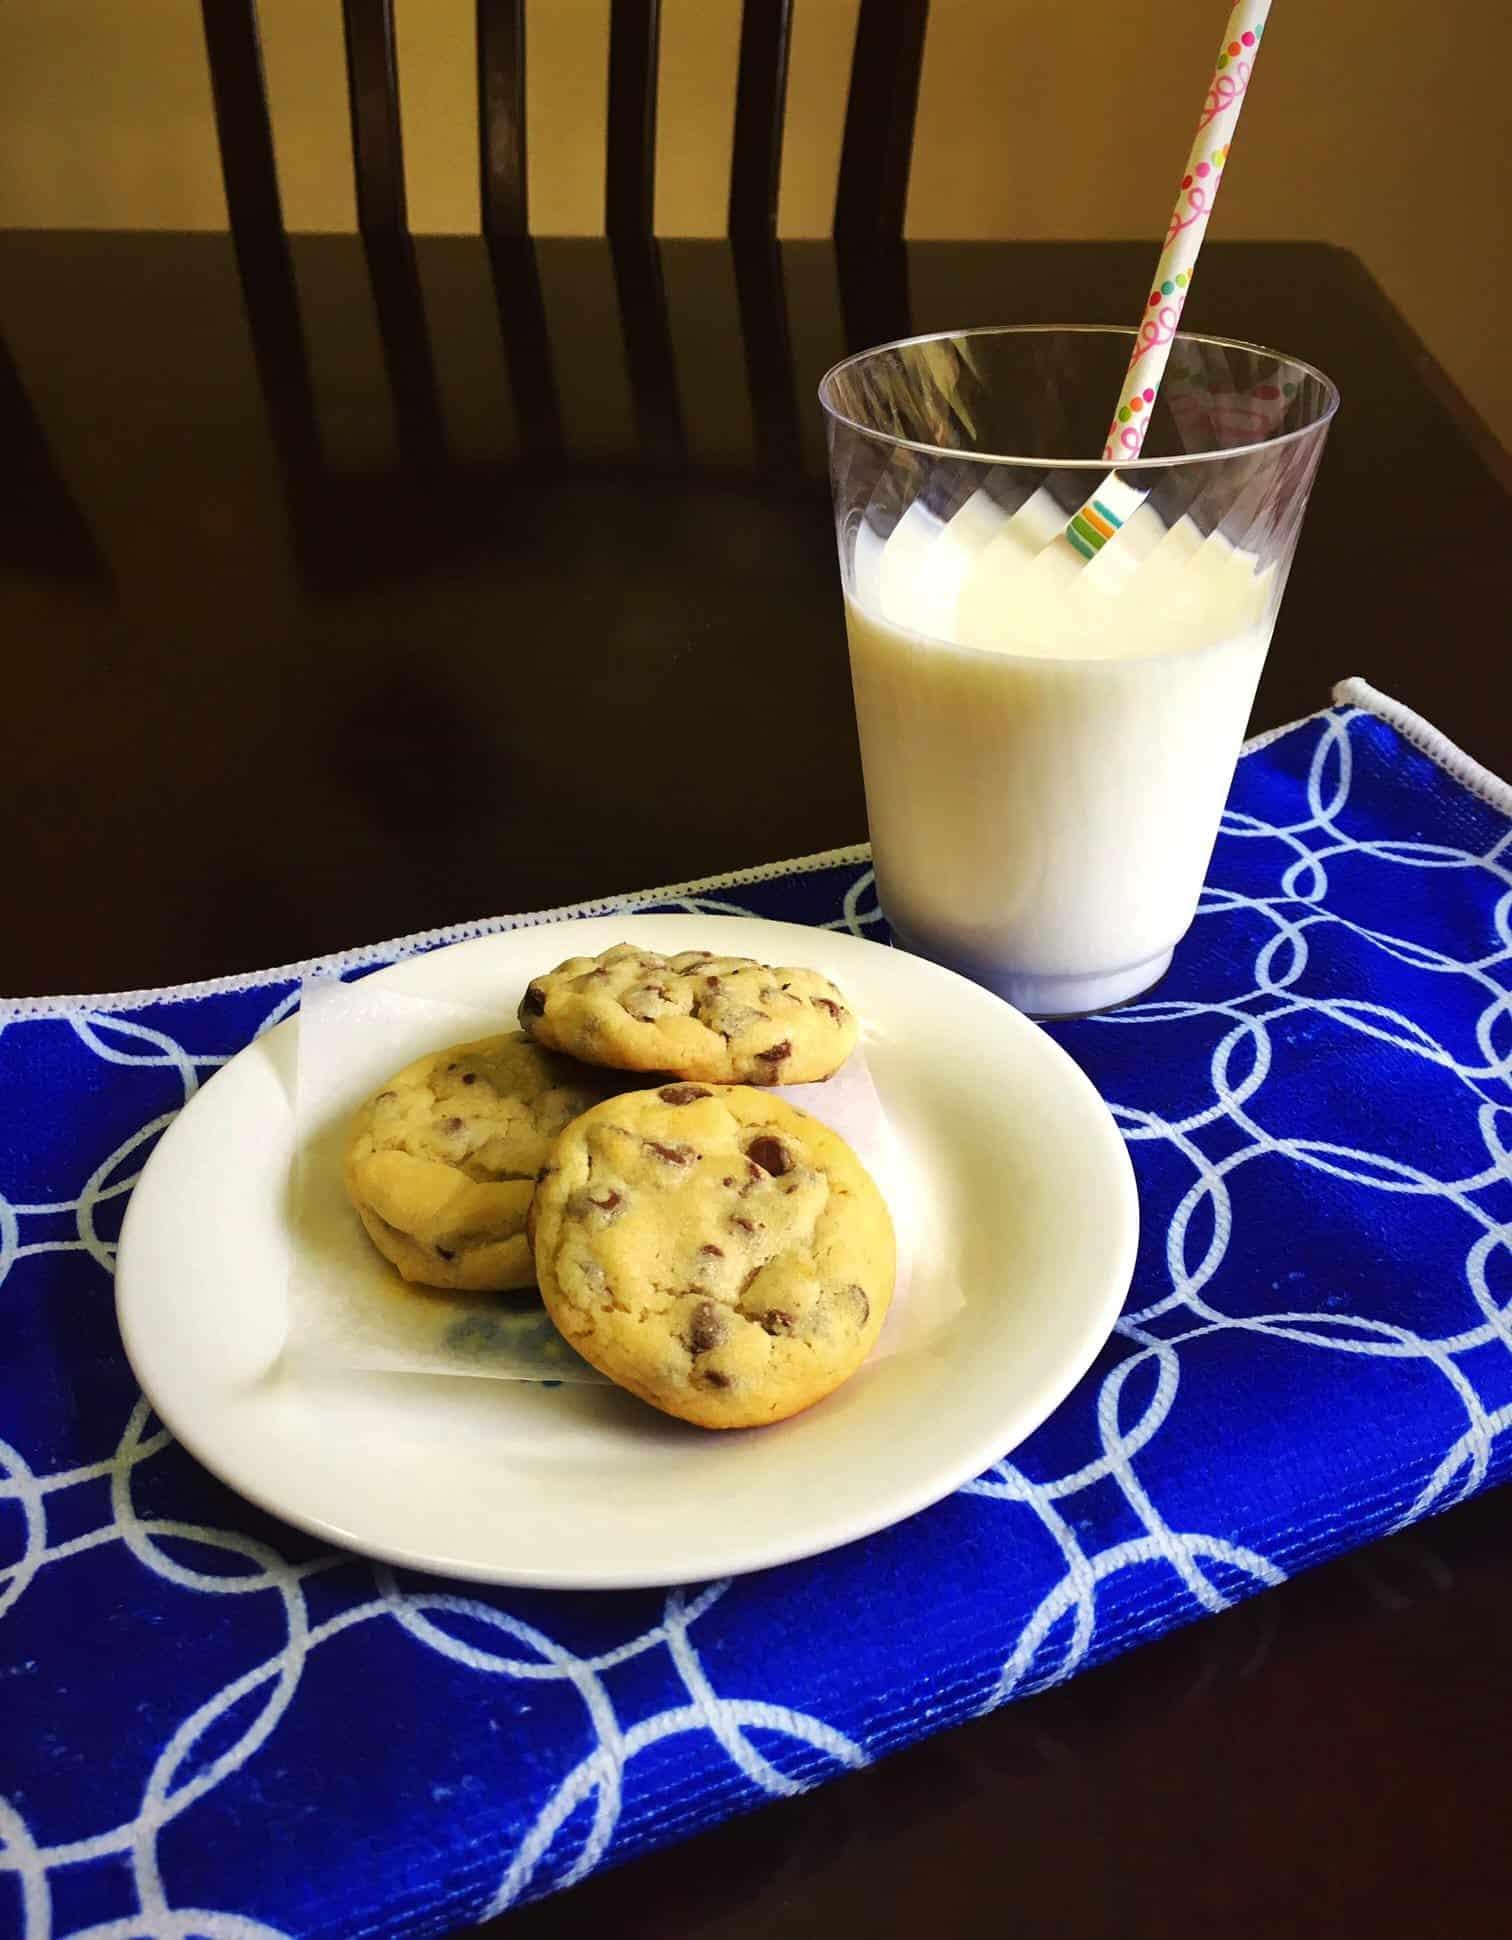 Chocolate Chip Cookie Recipe Using Self Rising Flour